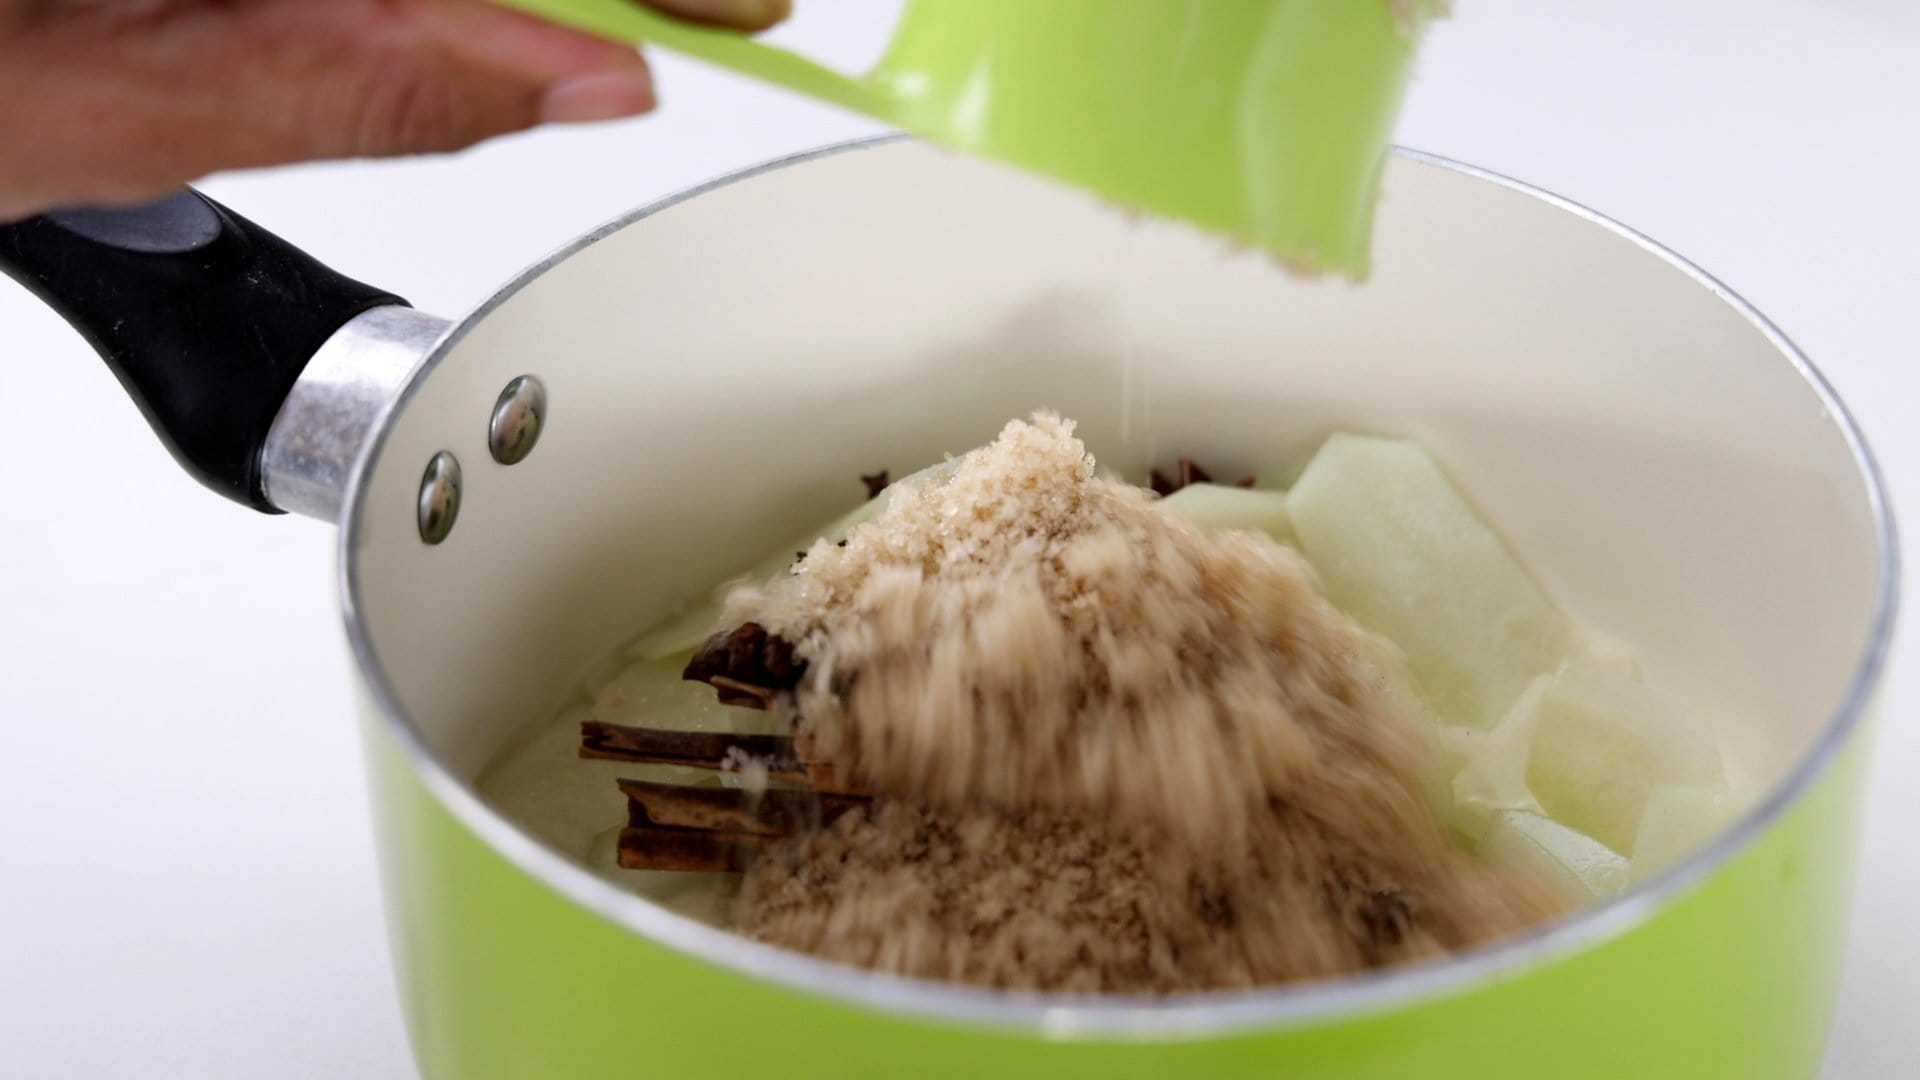 Agregando azúcar a la olla